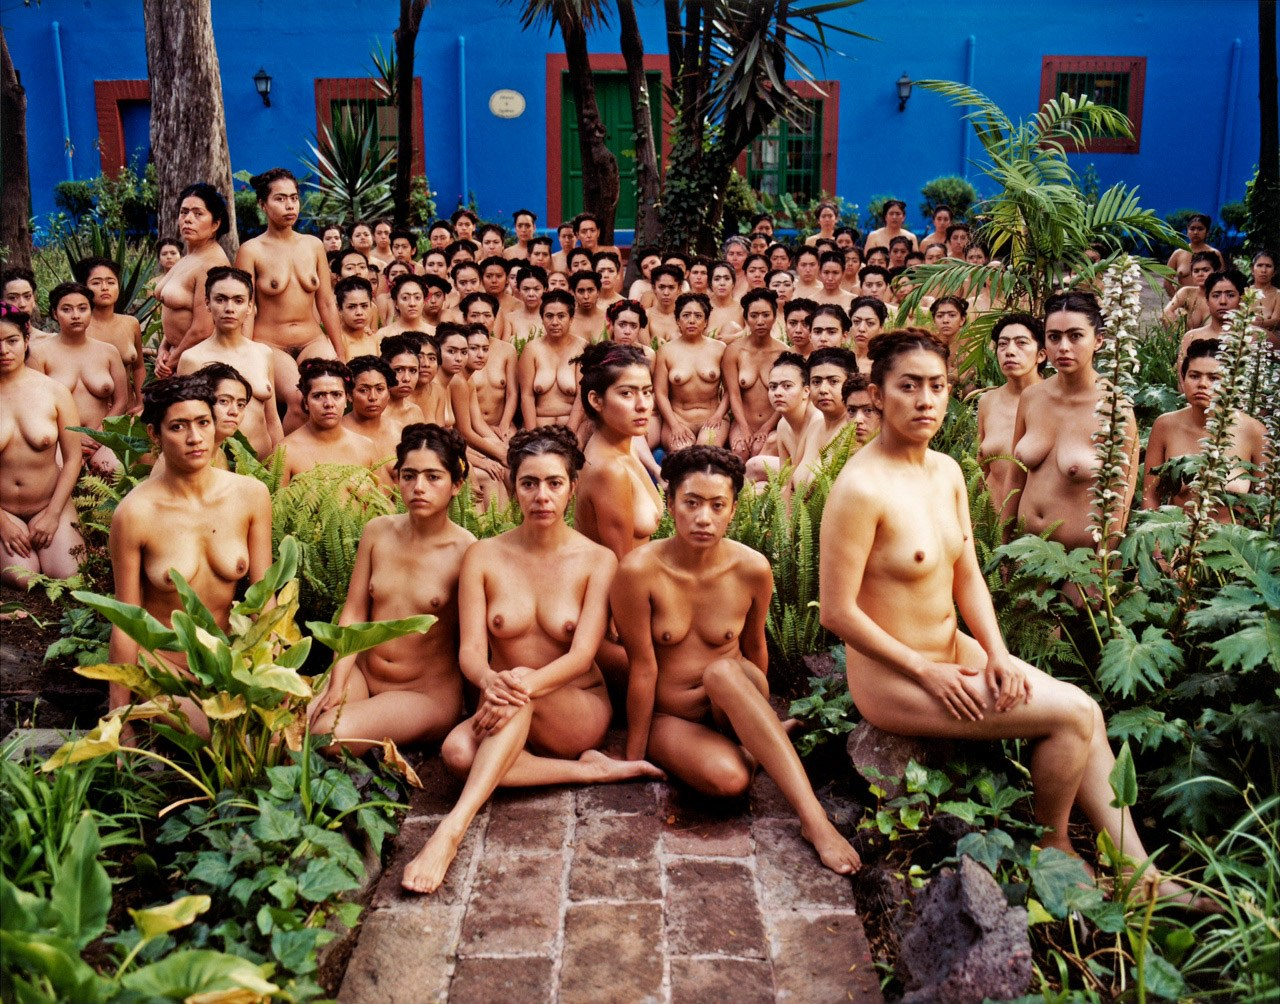 People sex nude